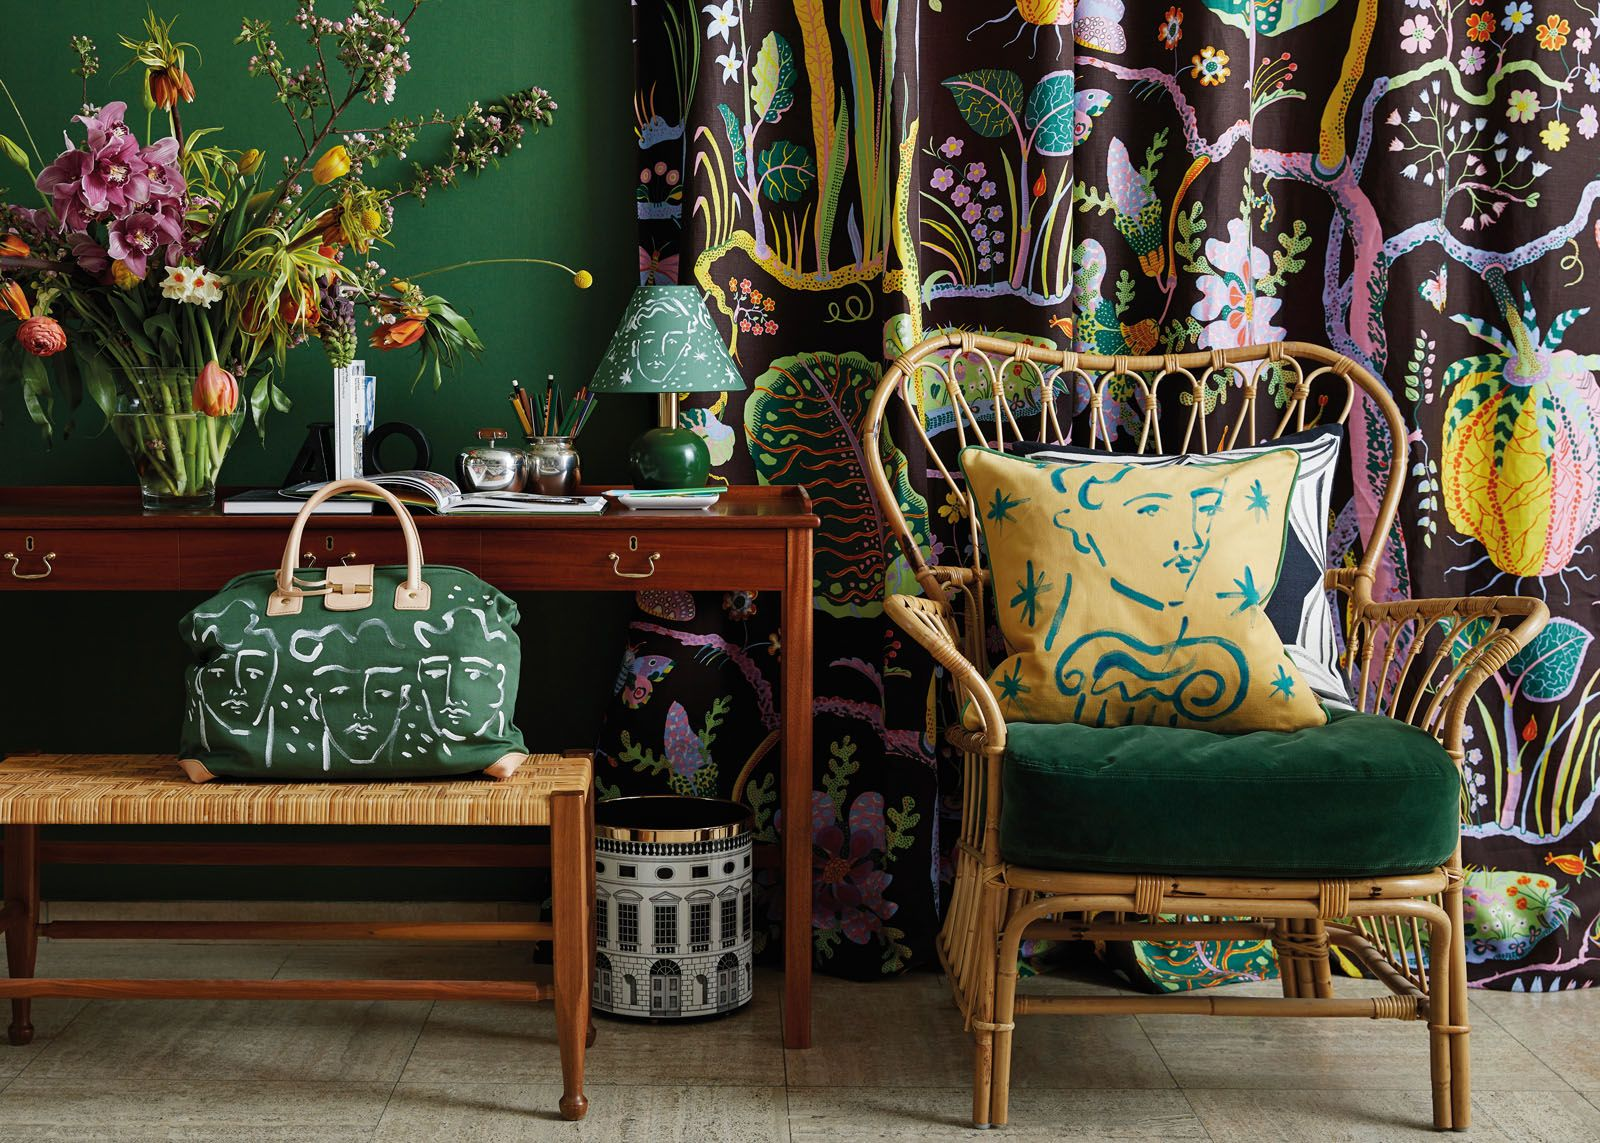 Accent cushions, handbag and table lamp from the Svenskt Tenn x Luke Edward Hall collection